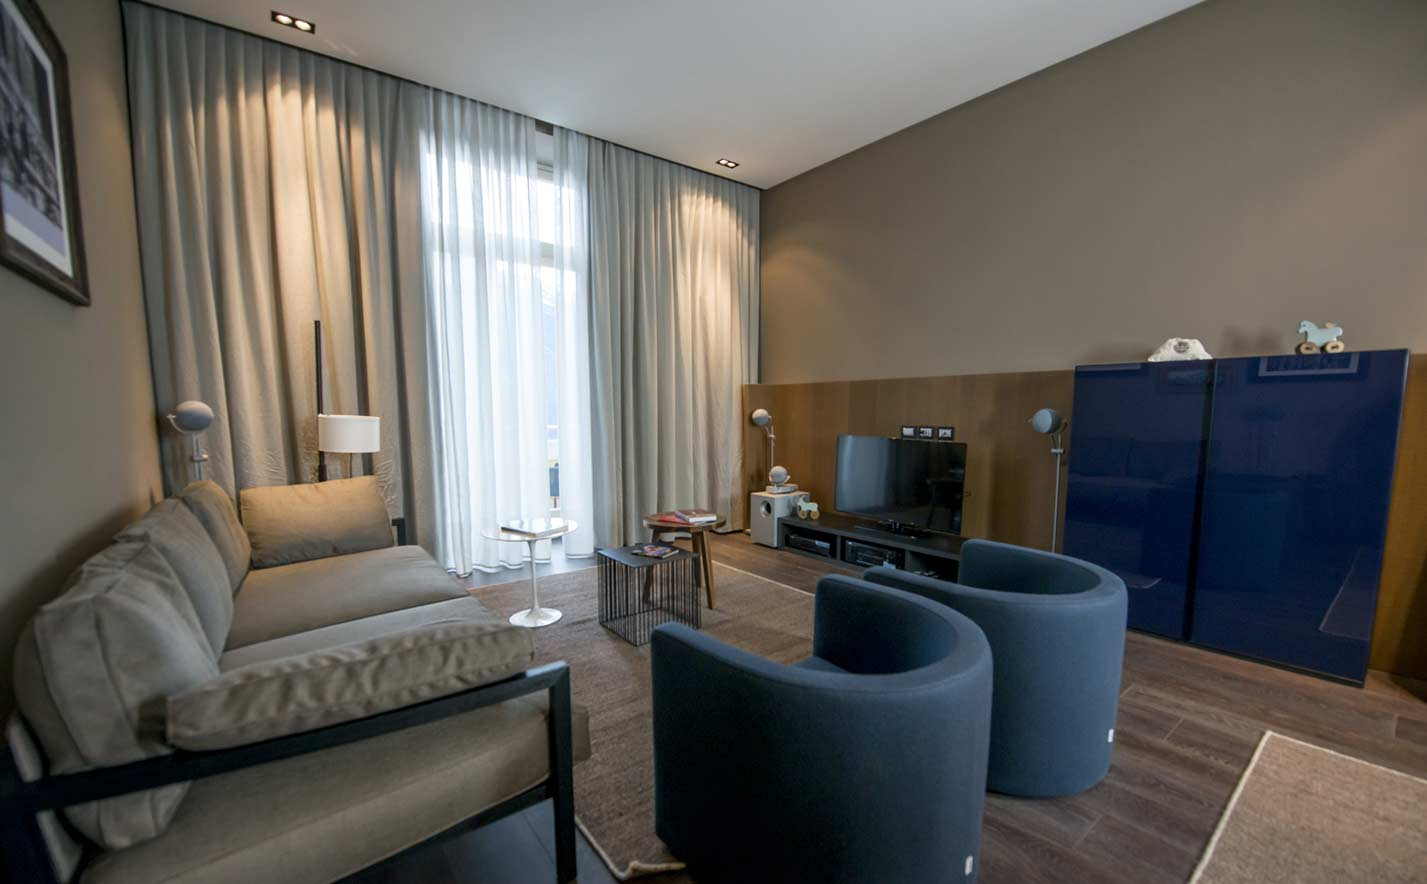 Presidential Room del Grand Hotel Billia di Saint-Vincent